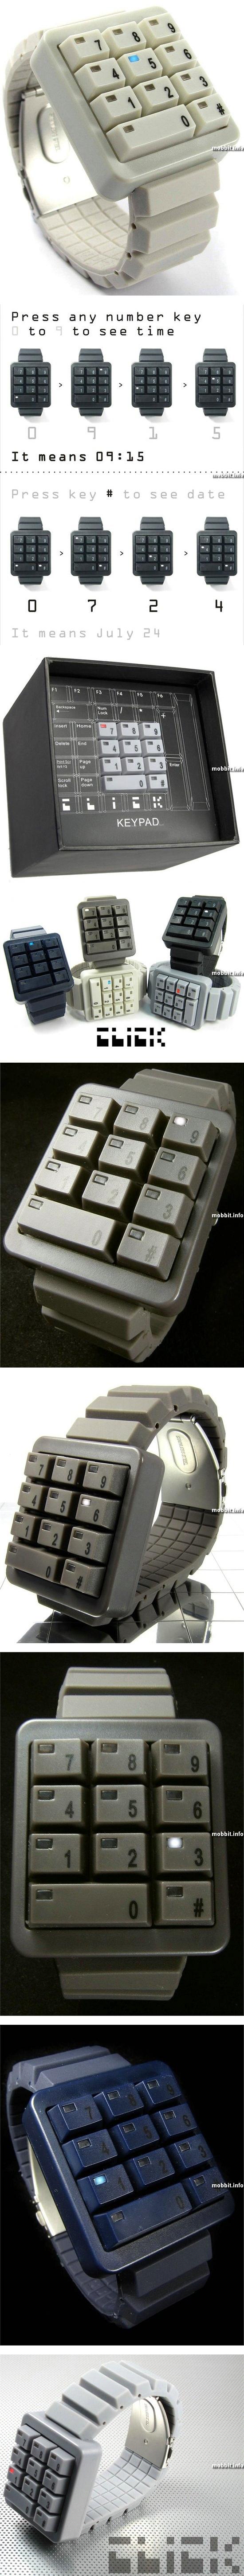 Click Keypad LED